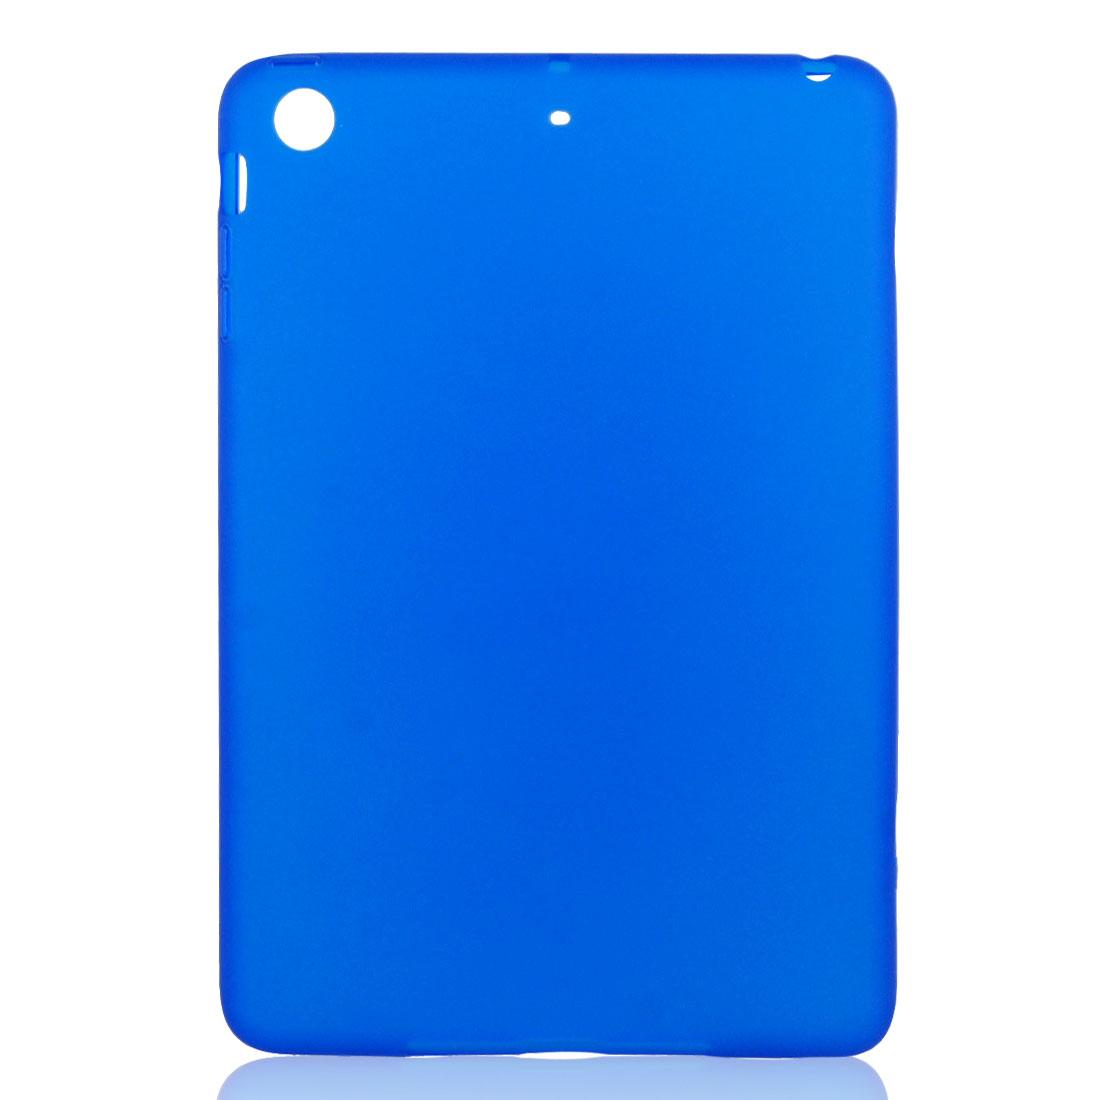 Dark Blue Soft Plastic Case Cover Protector for Apple iPad Mini